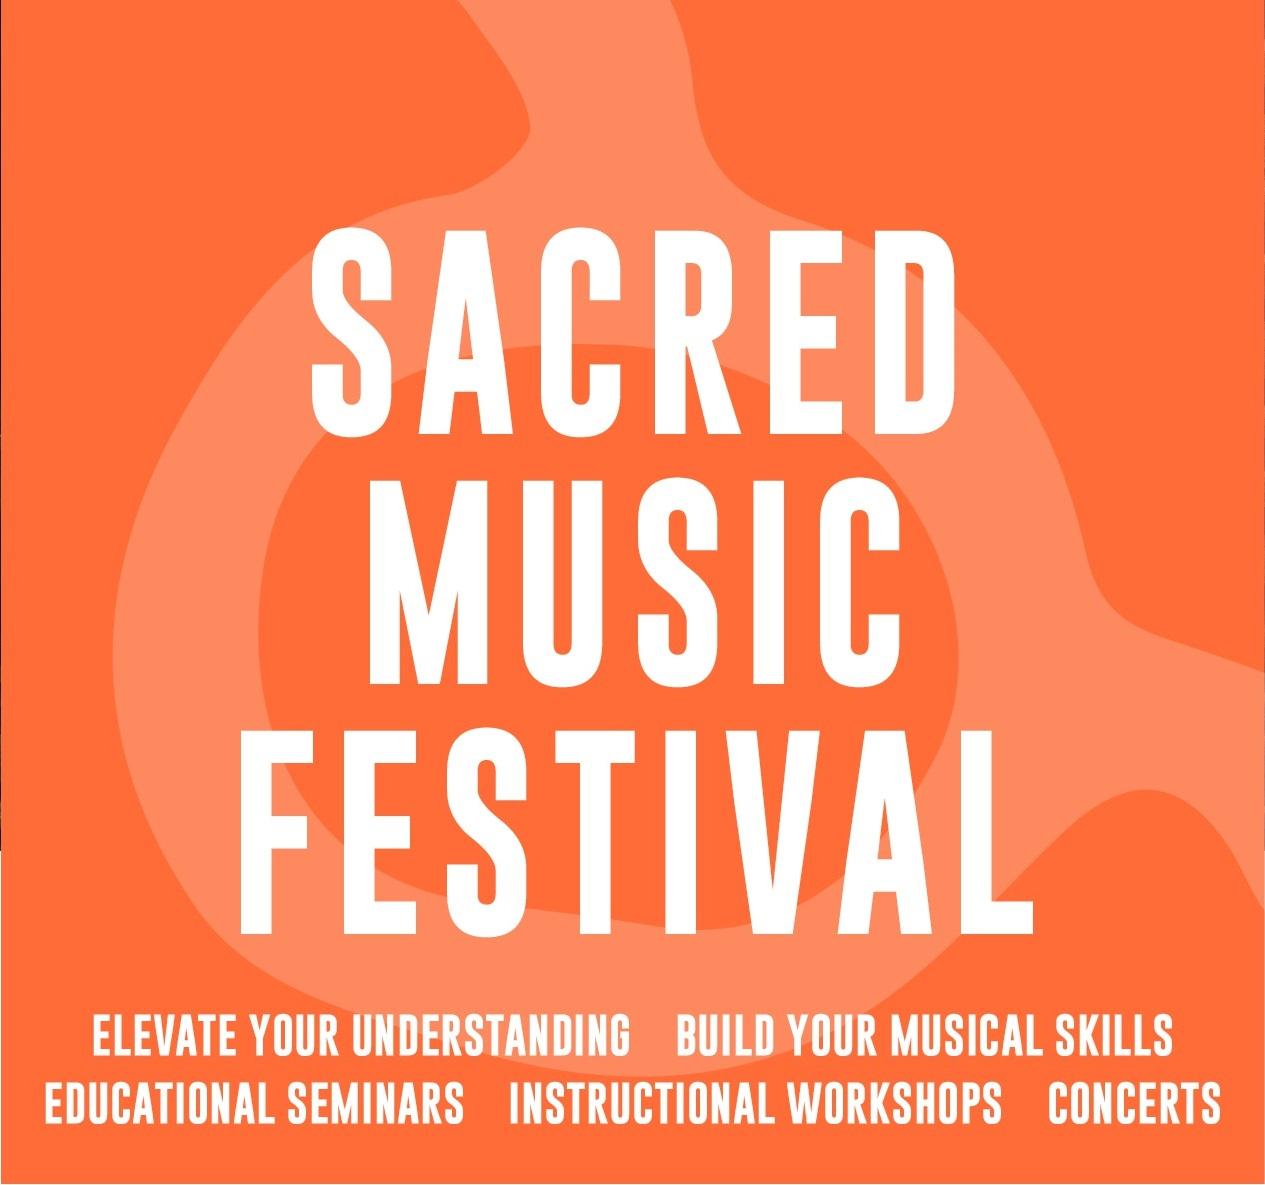 SacredMusicFestival sqaure